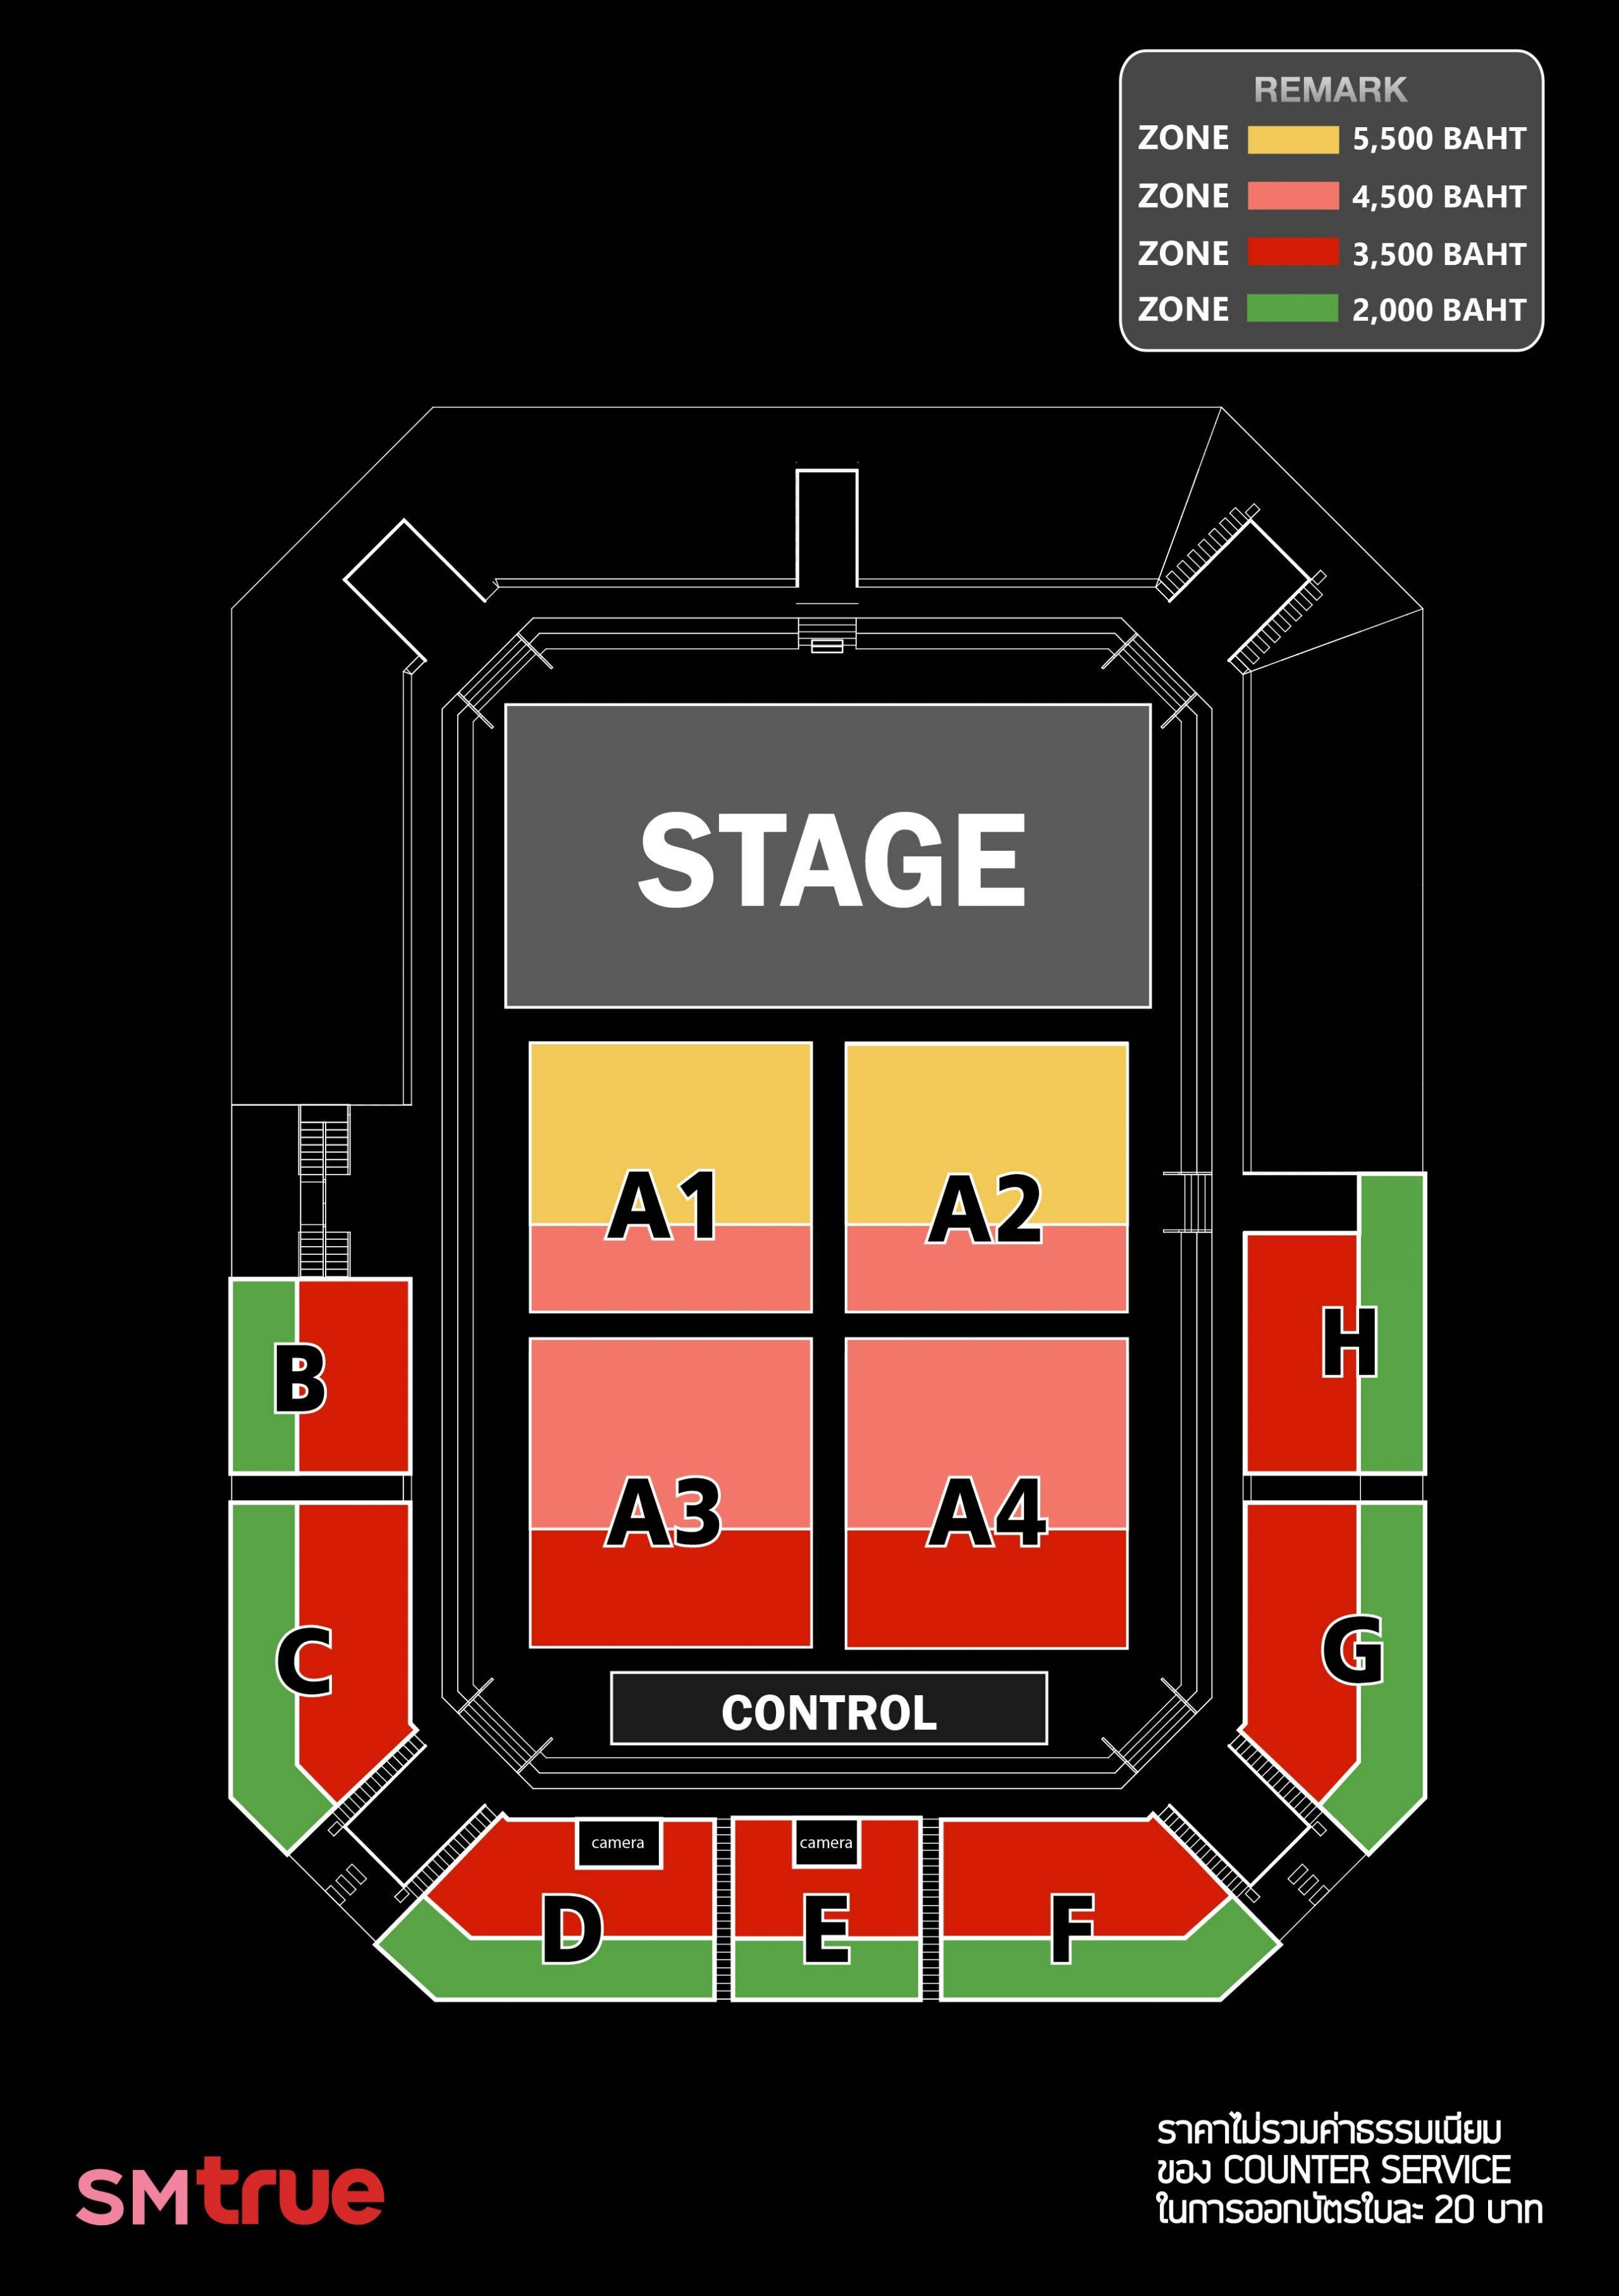 YOONA FANMEETING TOUR, So Wonderful Day #Story_1